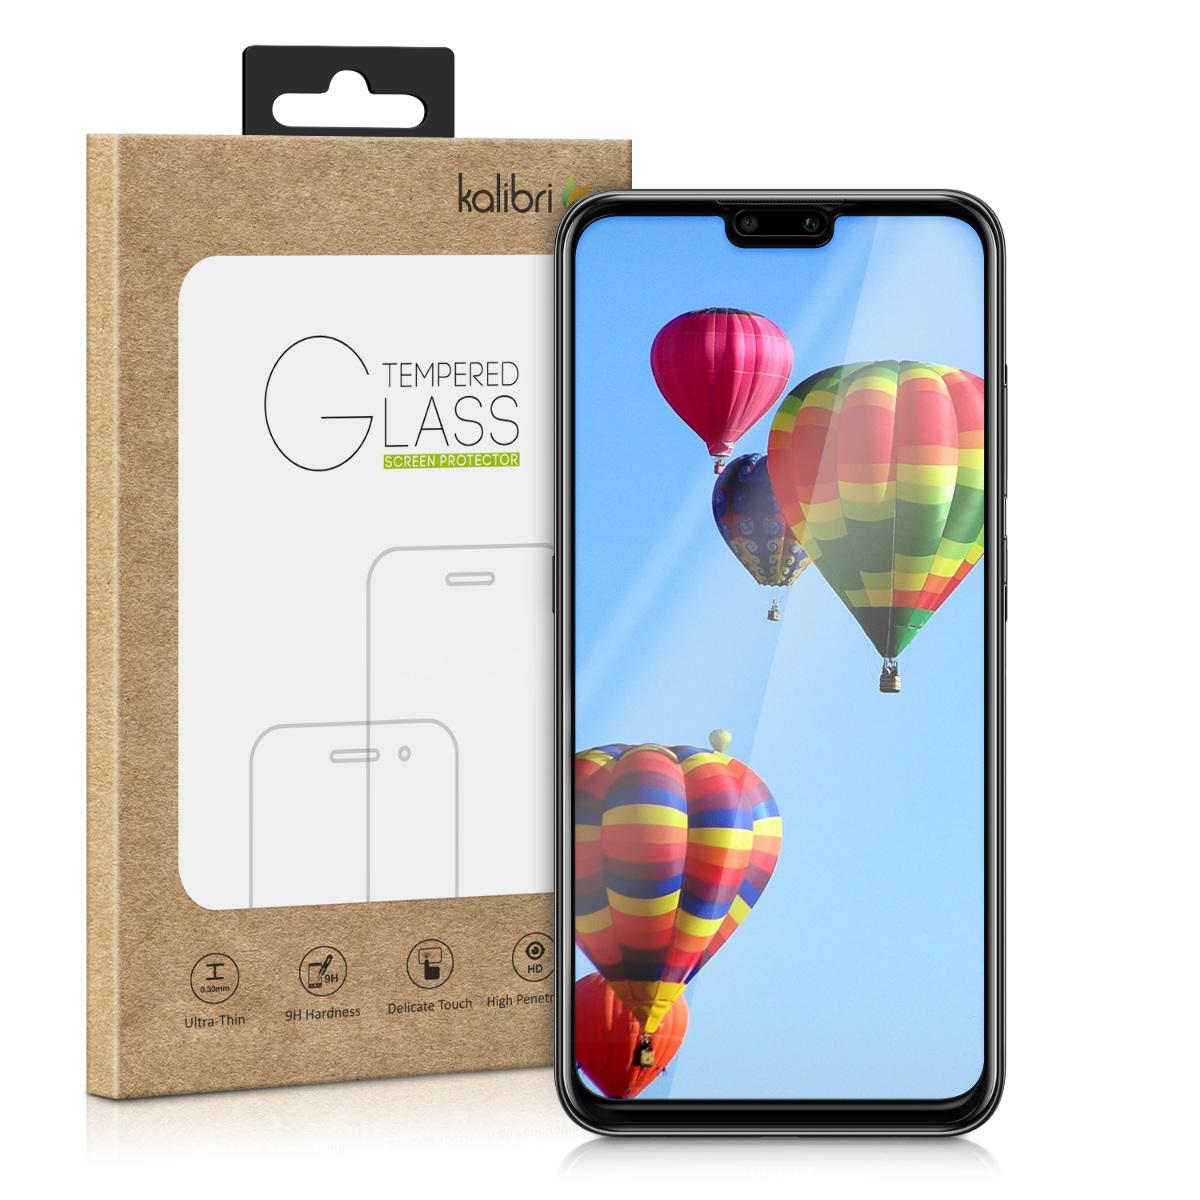 Kalibri Tempered Glass - Fullface Αντιχαρακτικό Γυαλί Οθόνης Huawei Y9 2019 - Black (48808.01)